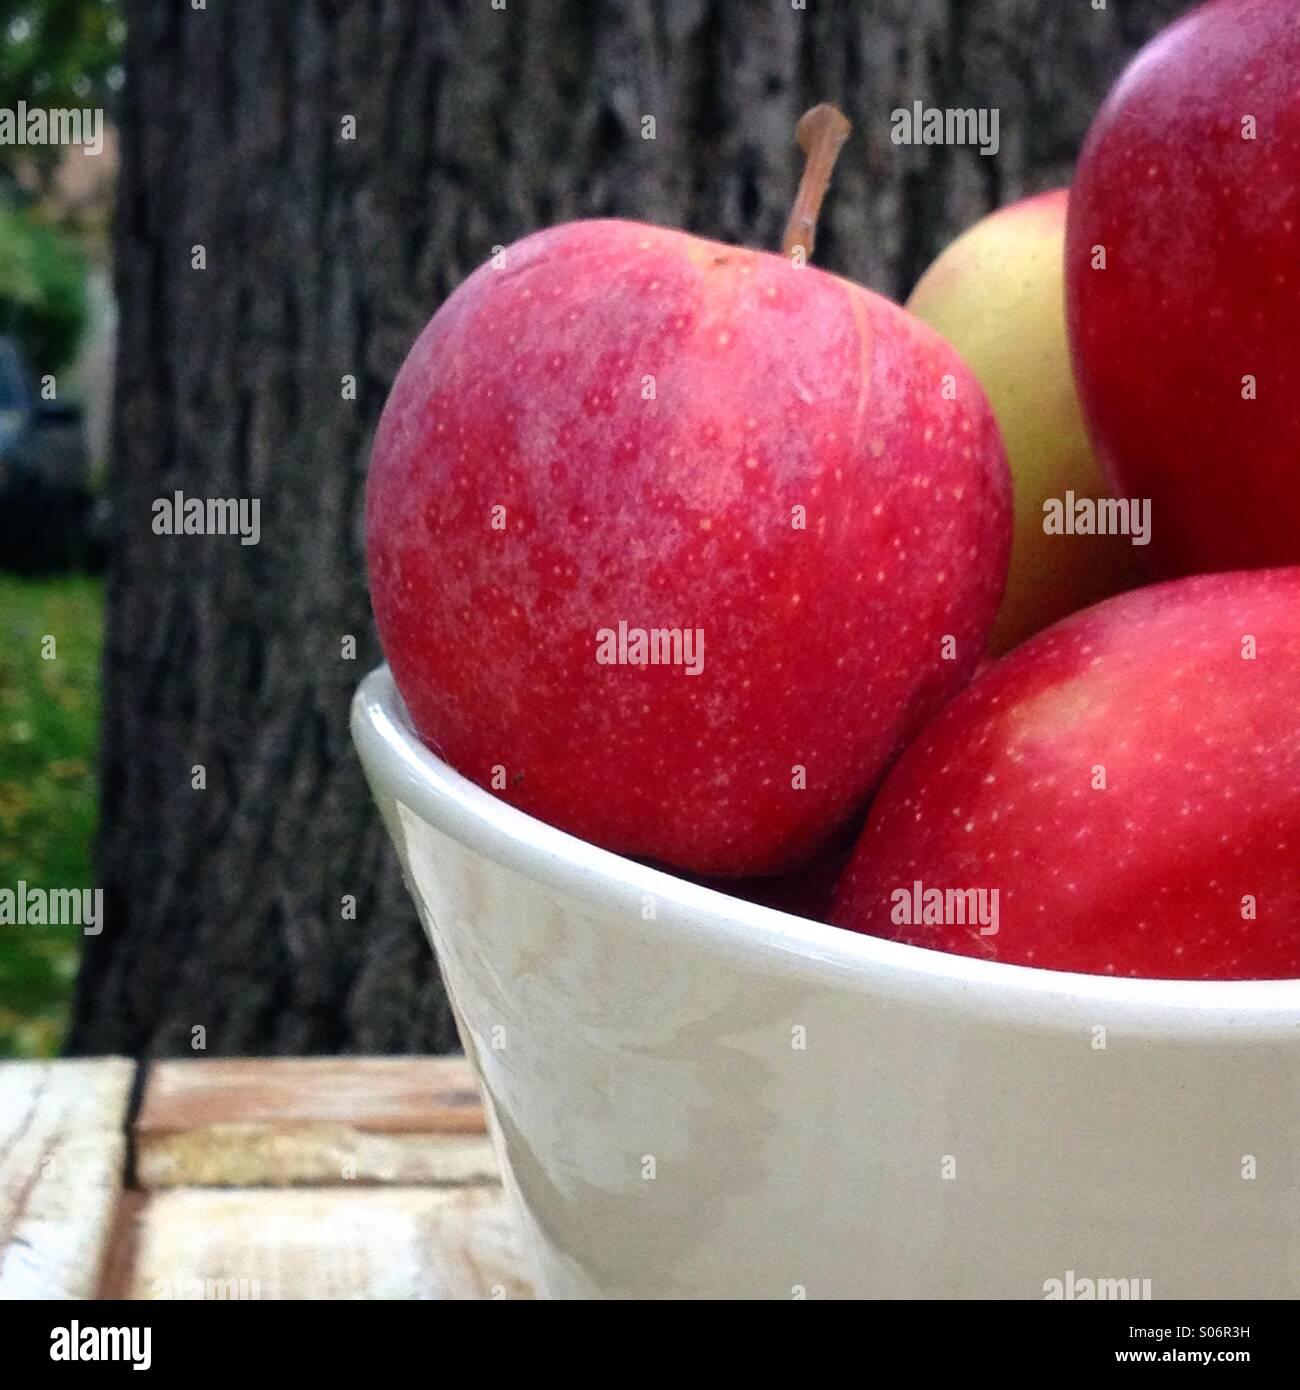 Freshly picked bowl of gala apples - Stock Image